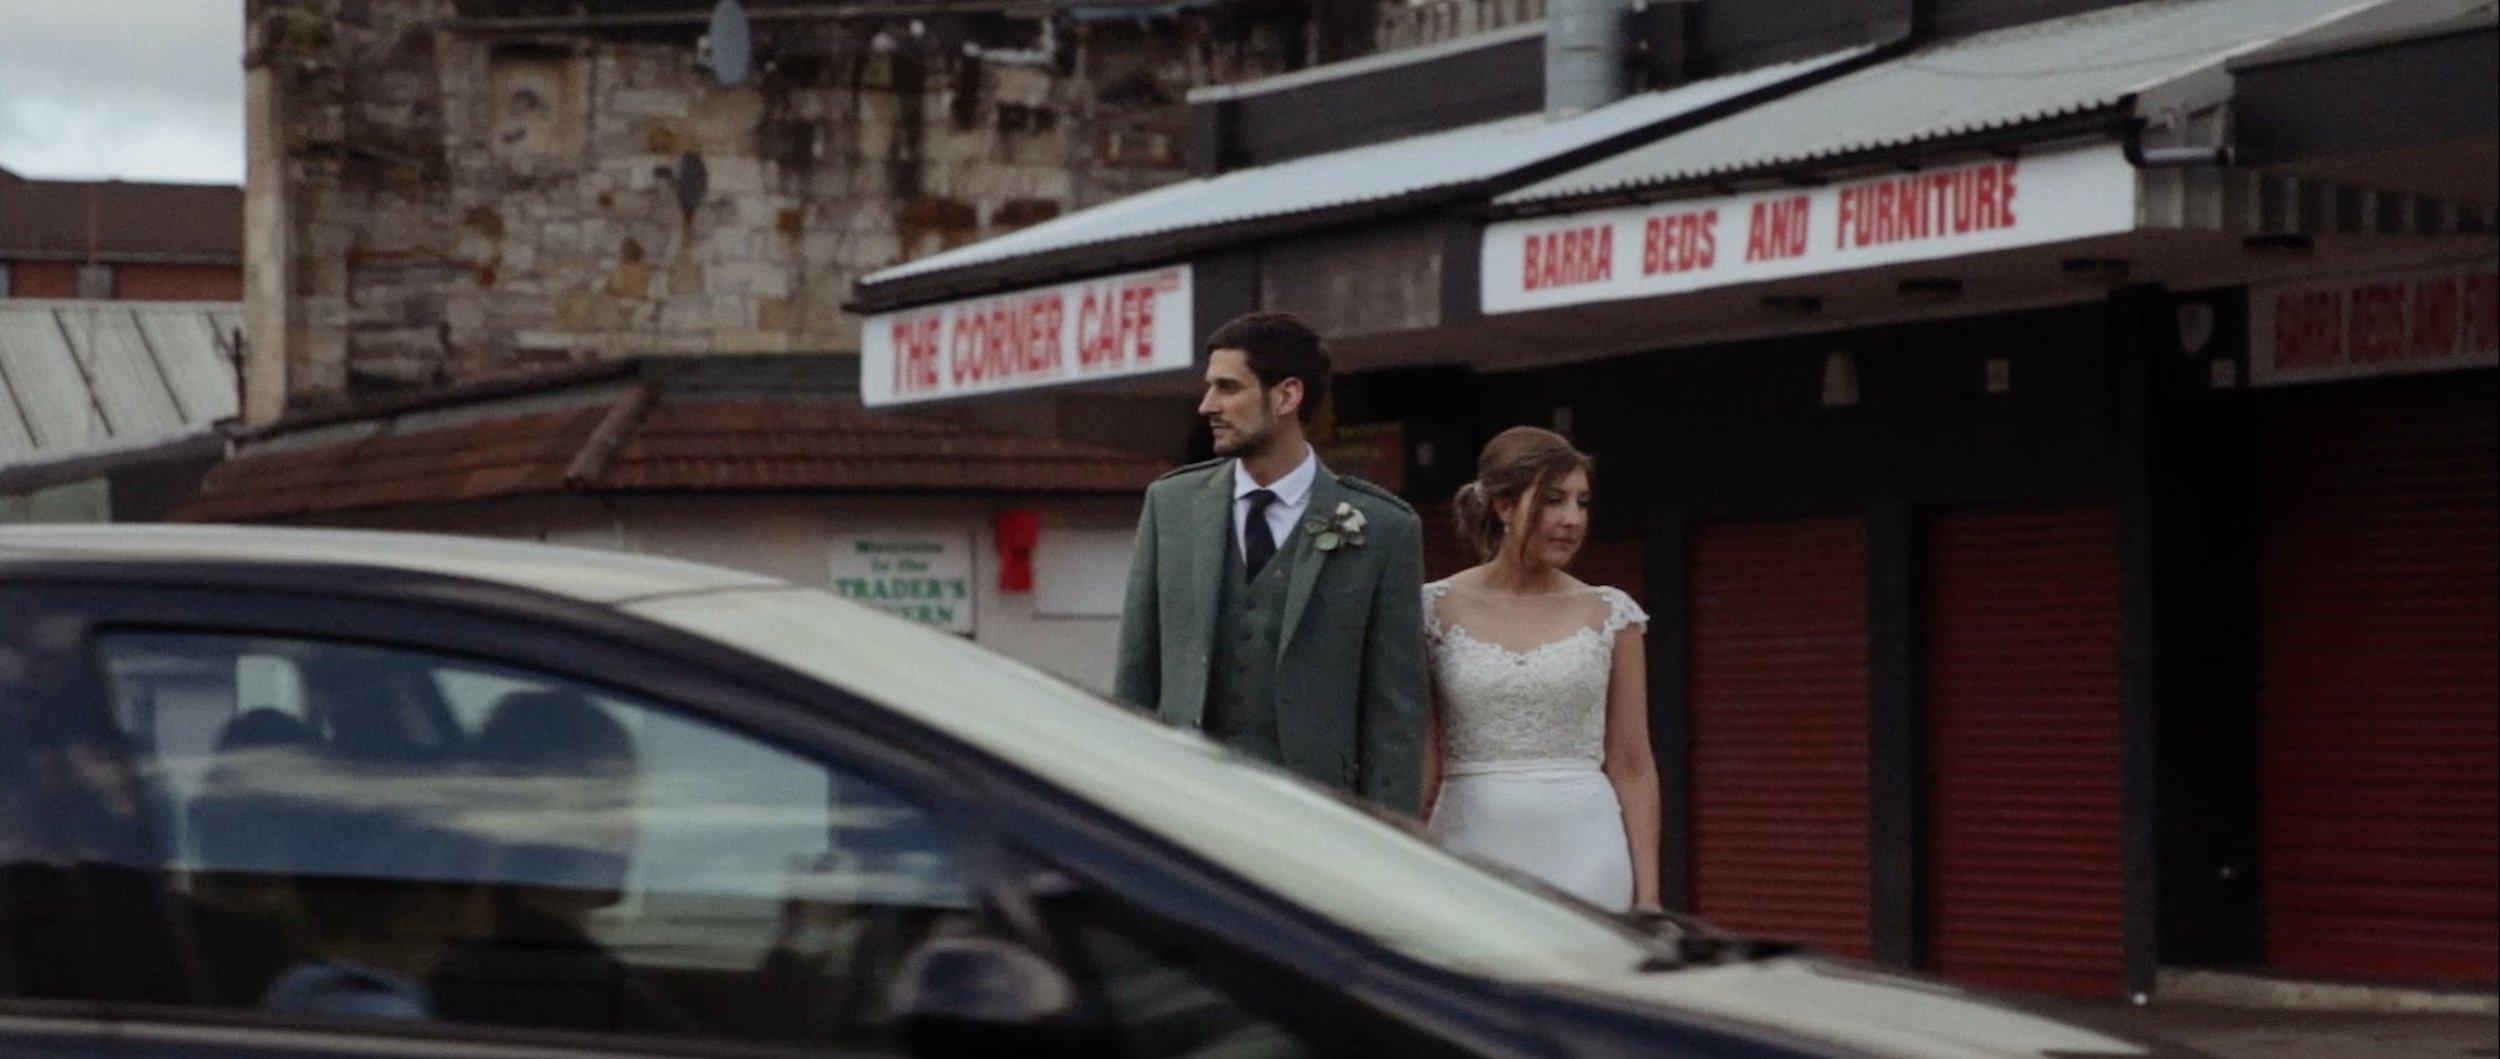 the-engine-works-wedding-videographer_LL_05.jpg